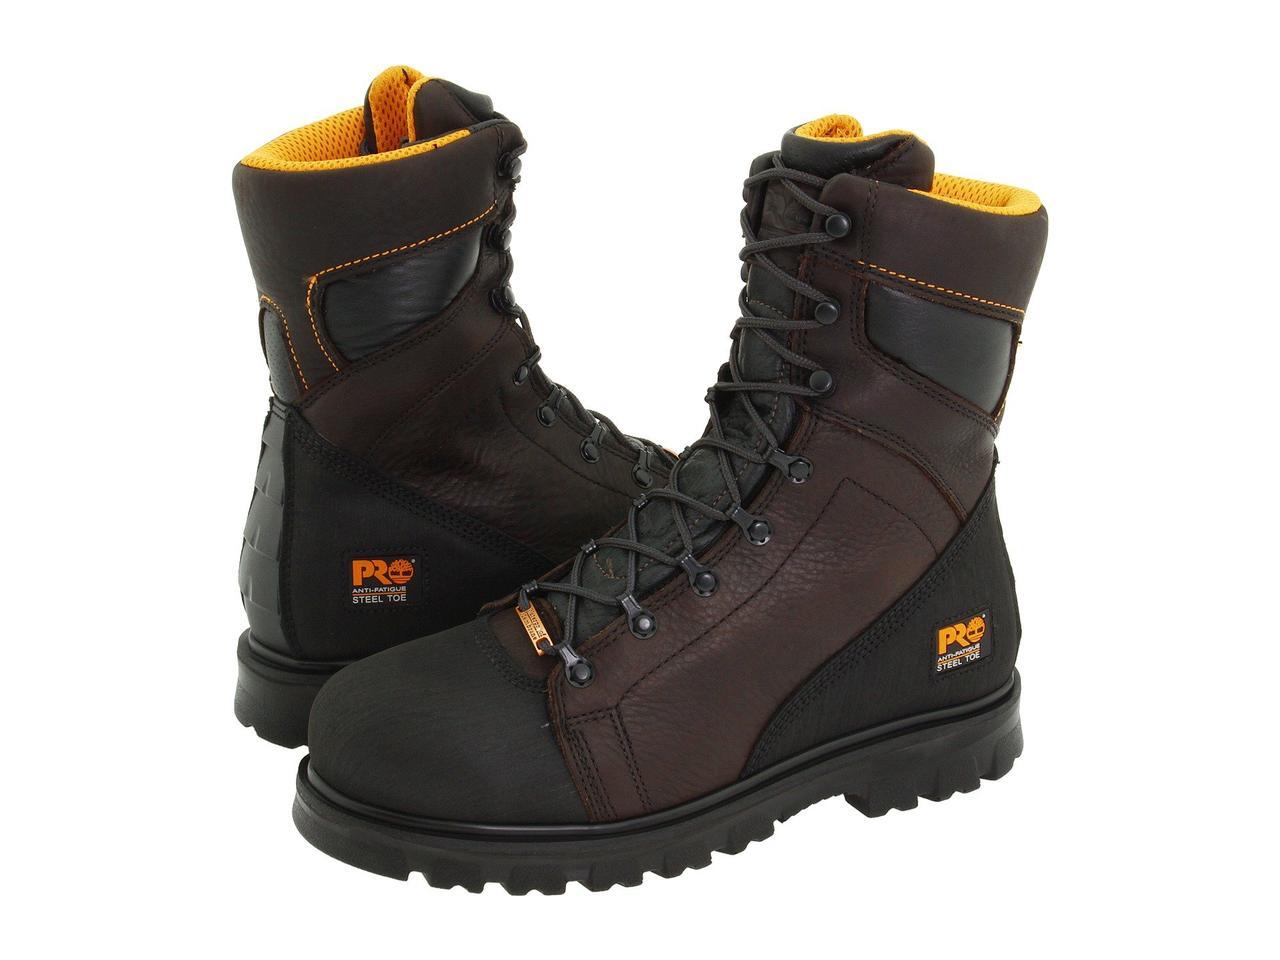 "Ботинки/Сапоги (Оригинал) Timberland PRO Rigmaster 8"" Waterproof Steel Toe Dark Brown/Black"